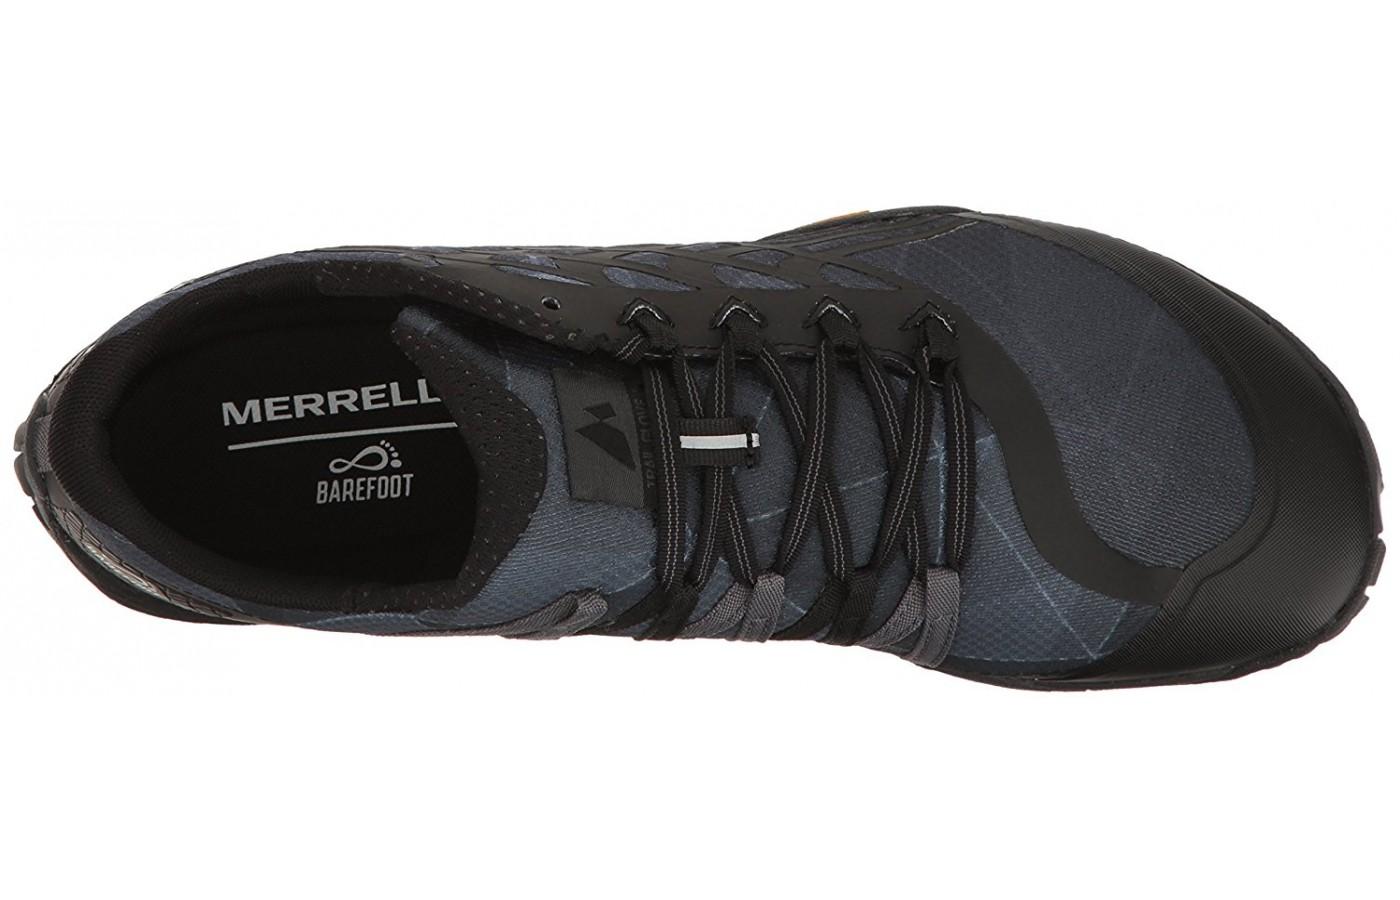 Merrell Trail Glove 4 upper